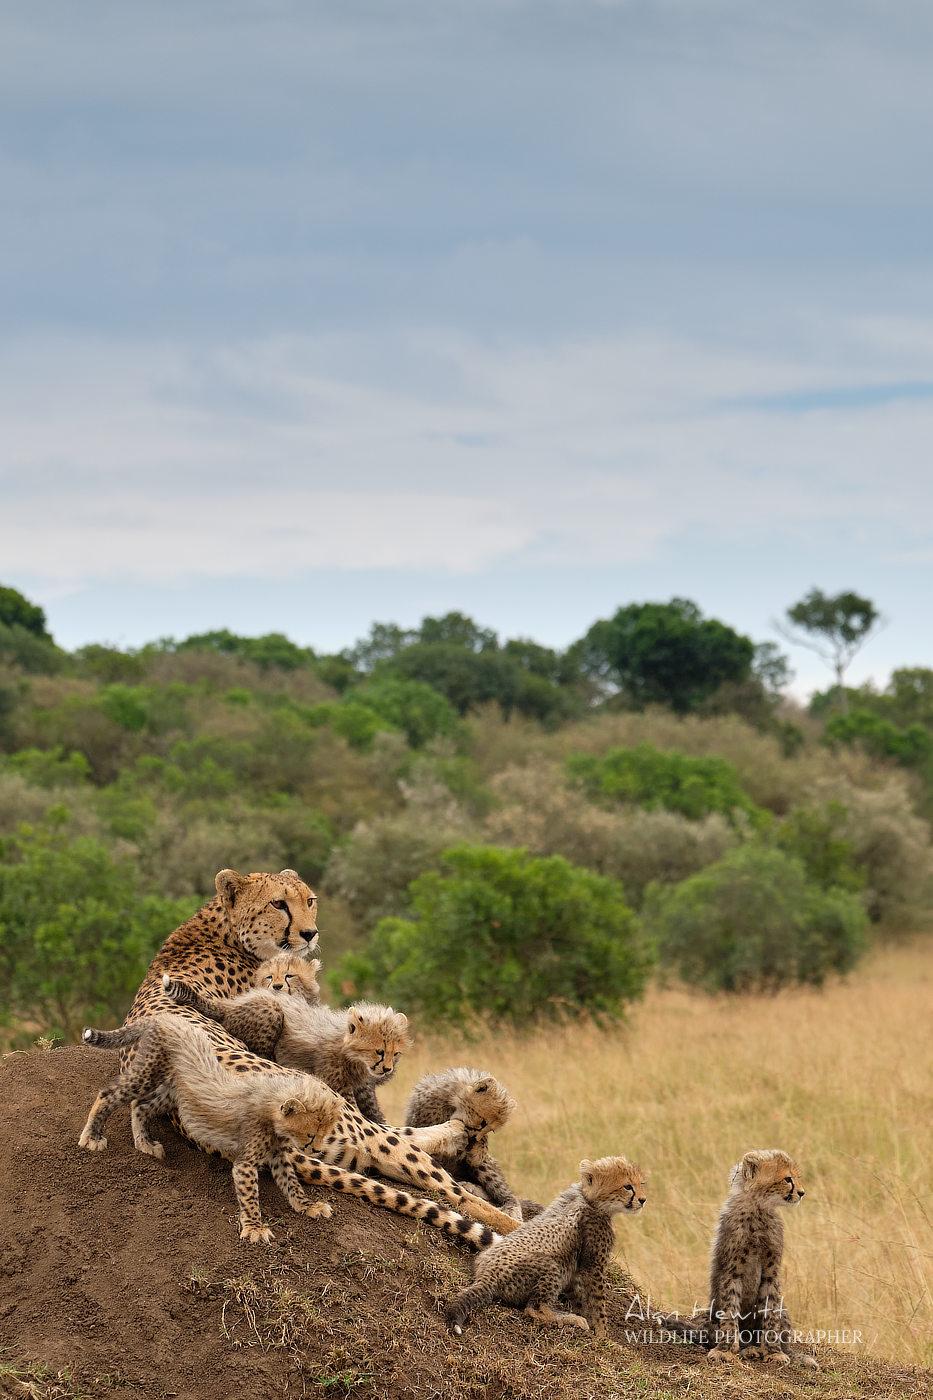 Cheetah & Cubs, Masai Mara Graduated filters and wildlife photography